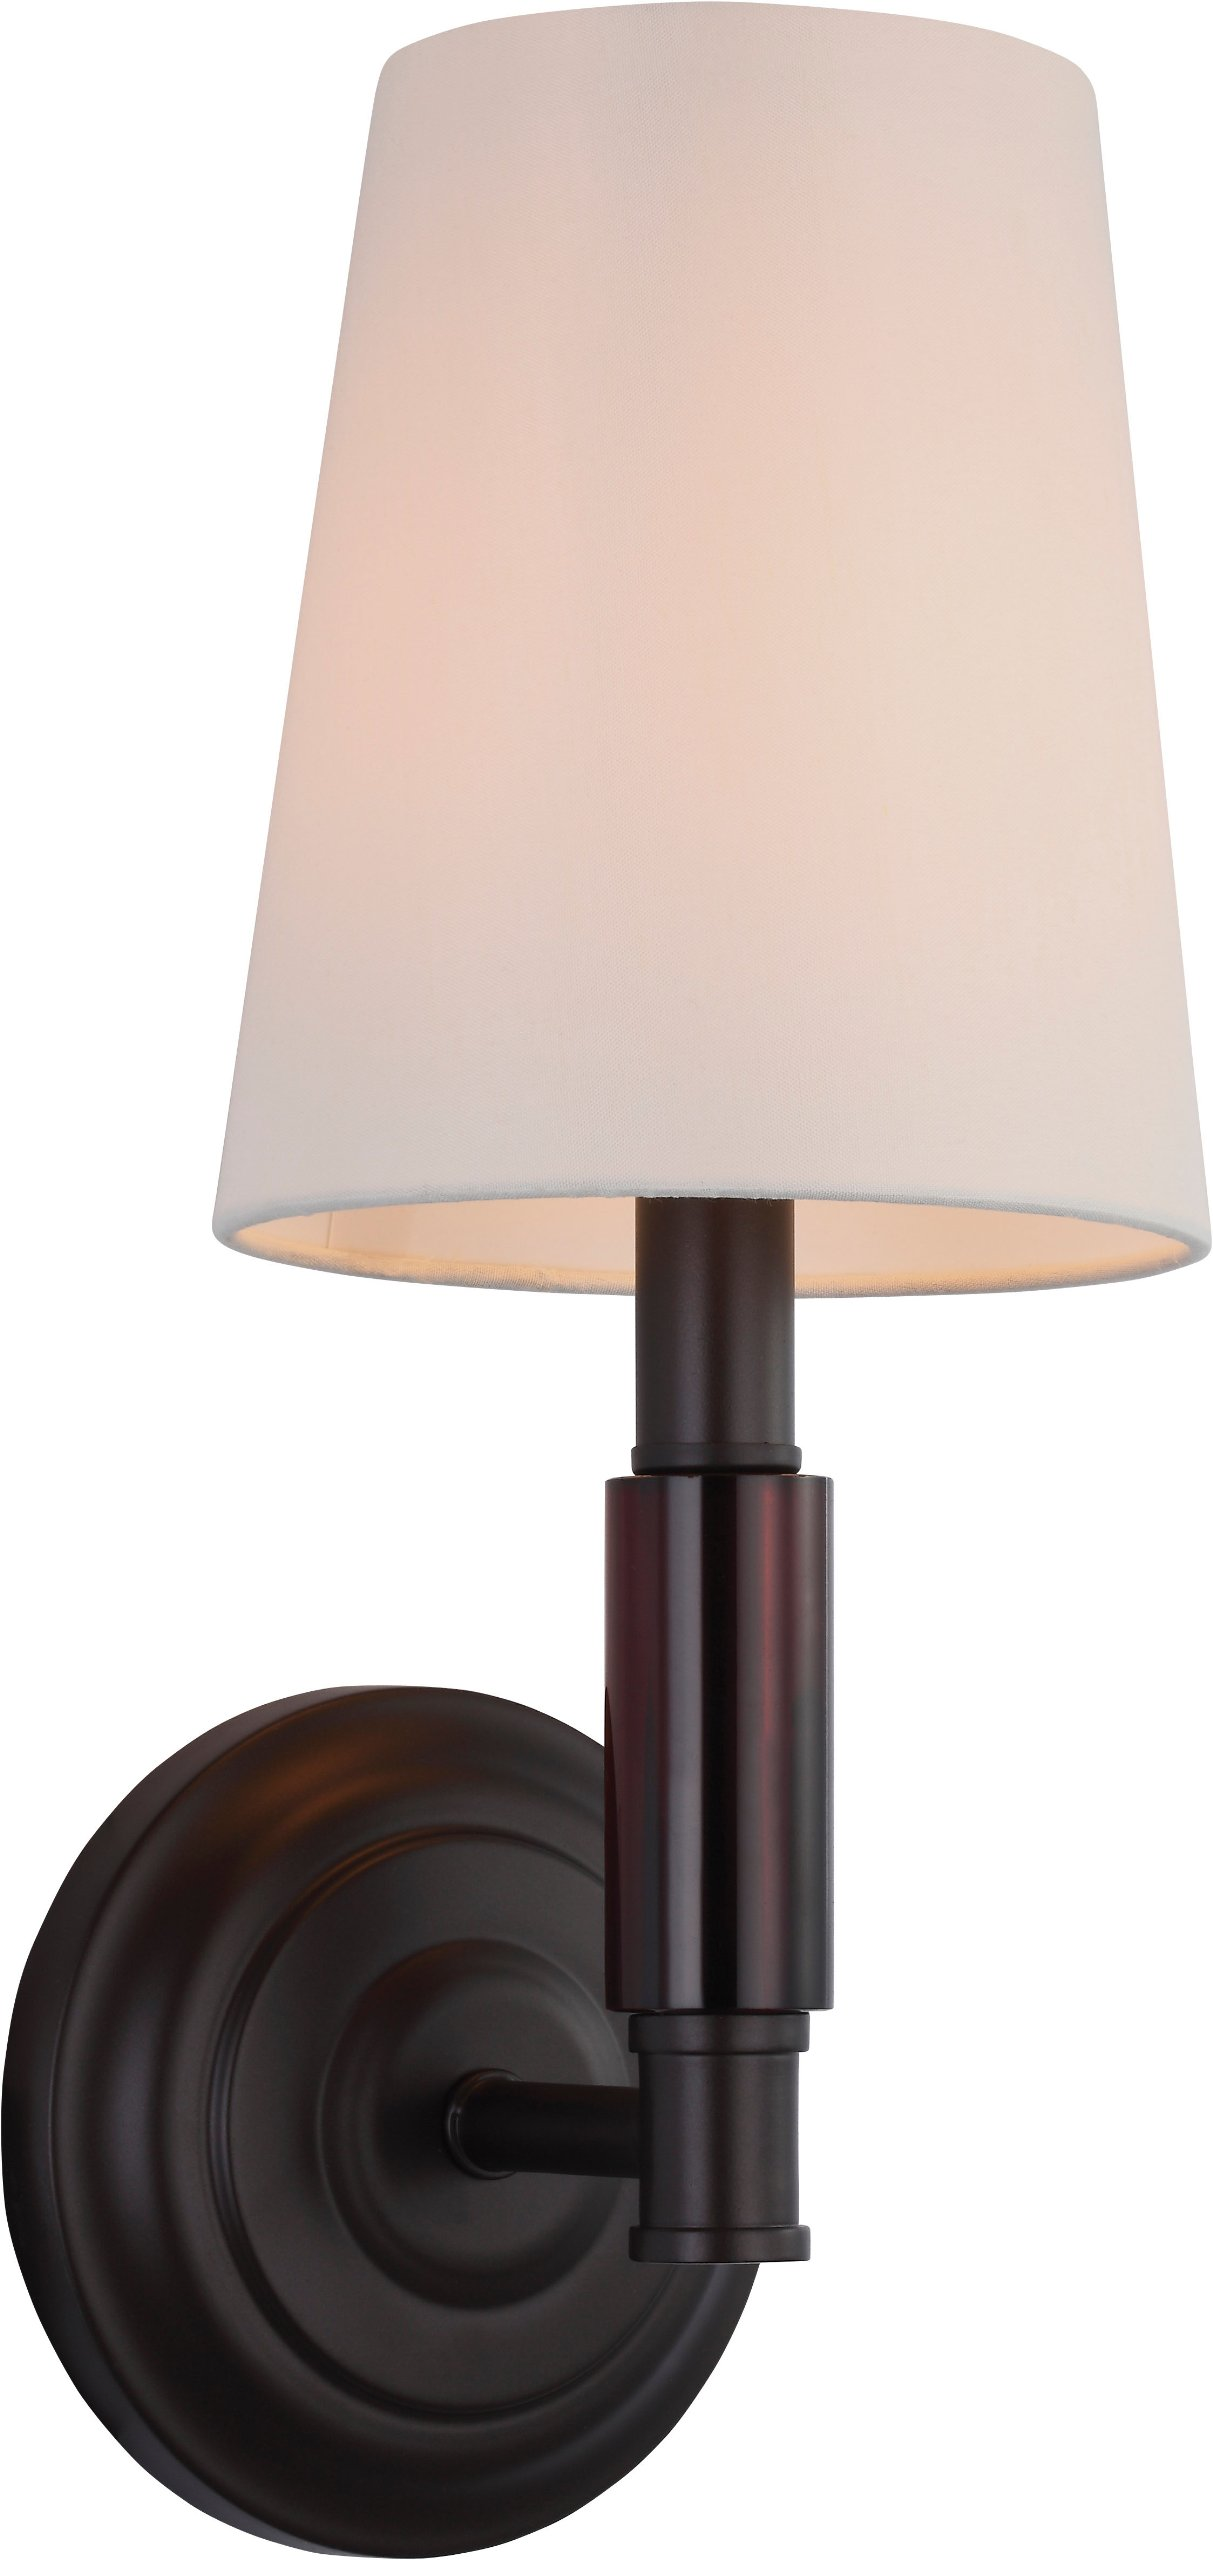 Feiss WB1717ORB Lismore Fabric Shade Wall Sconce Lighting, Bronze, 1-Light (6''W x 14''H) 60watts